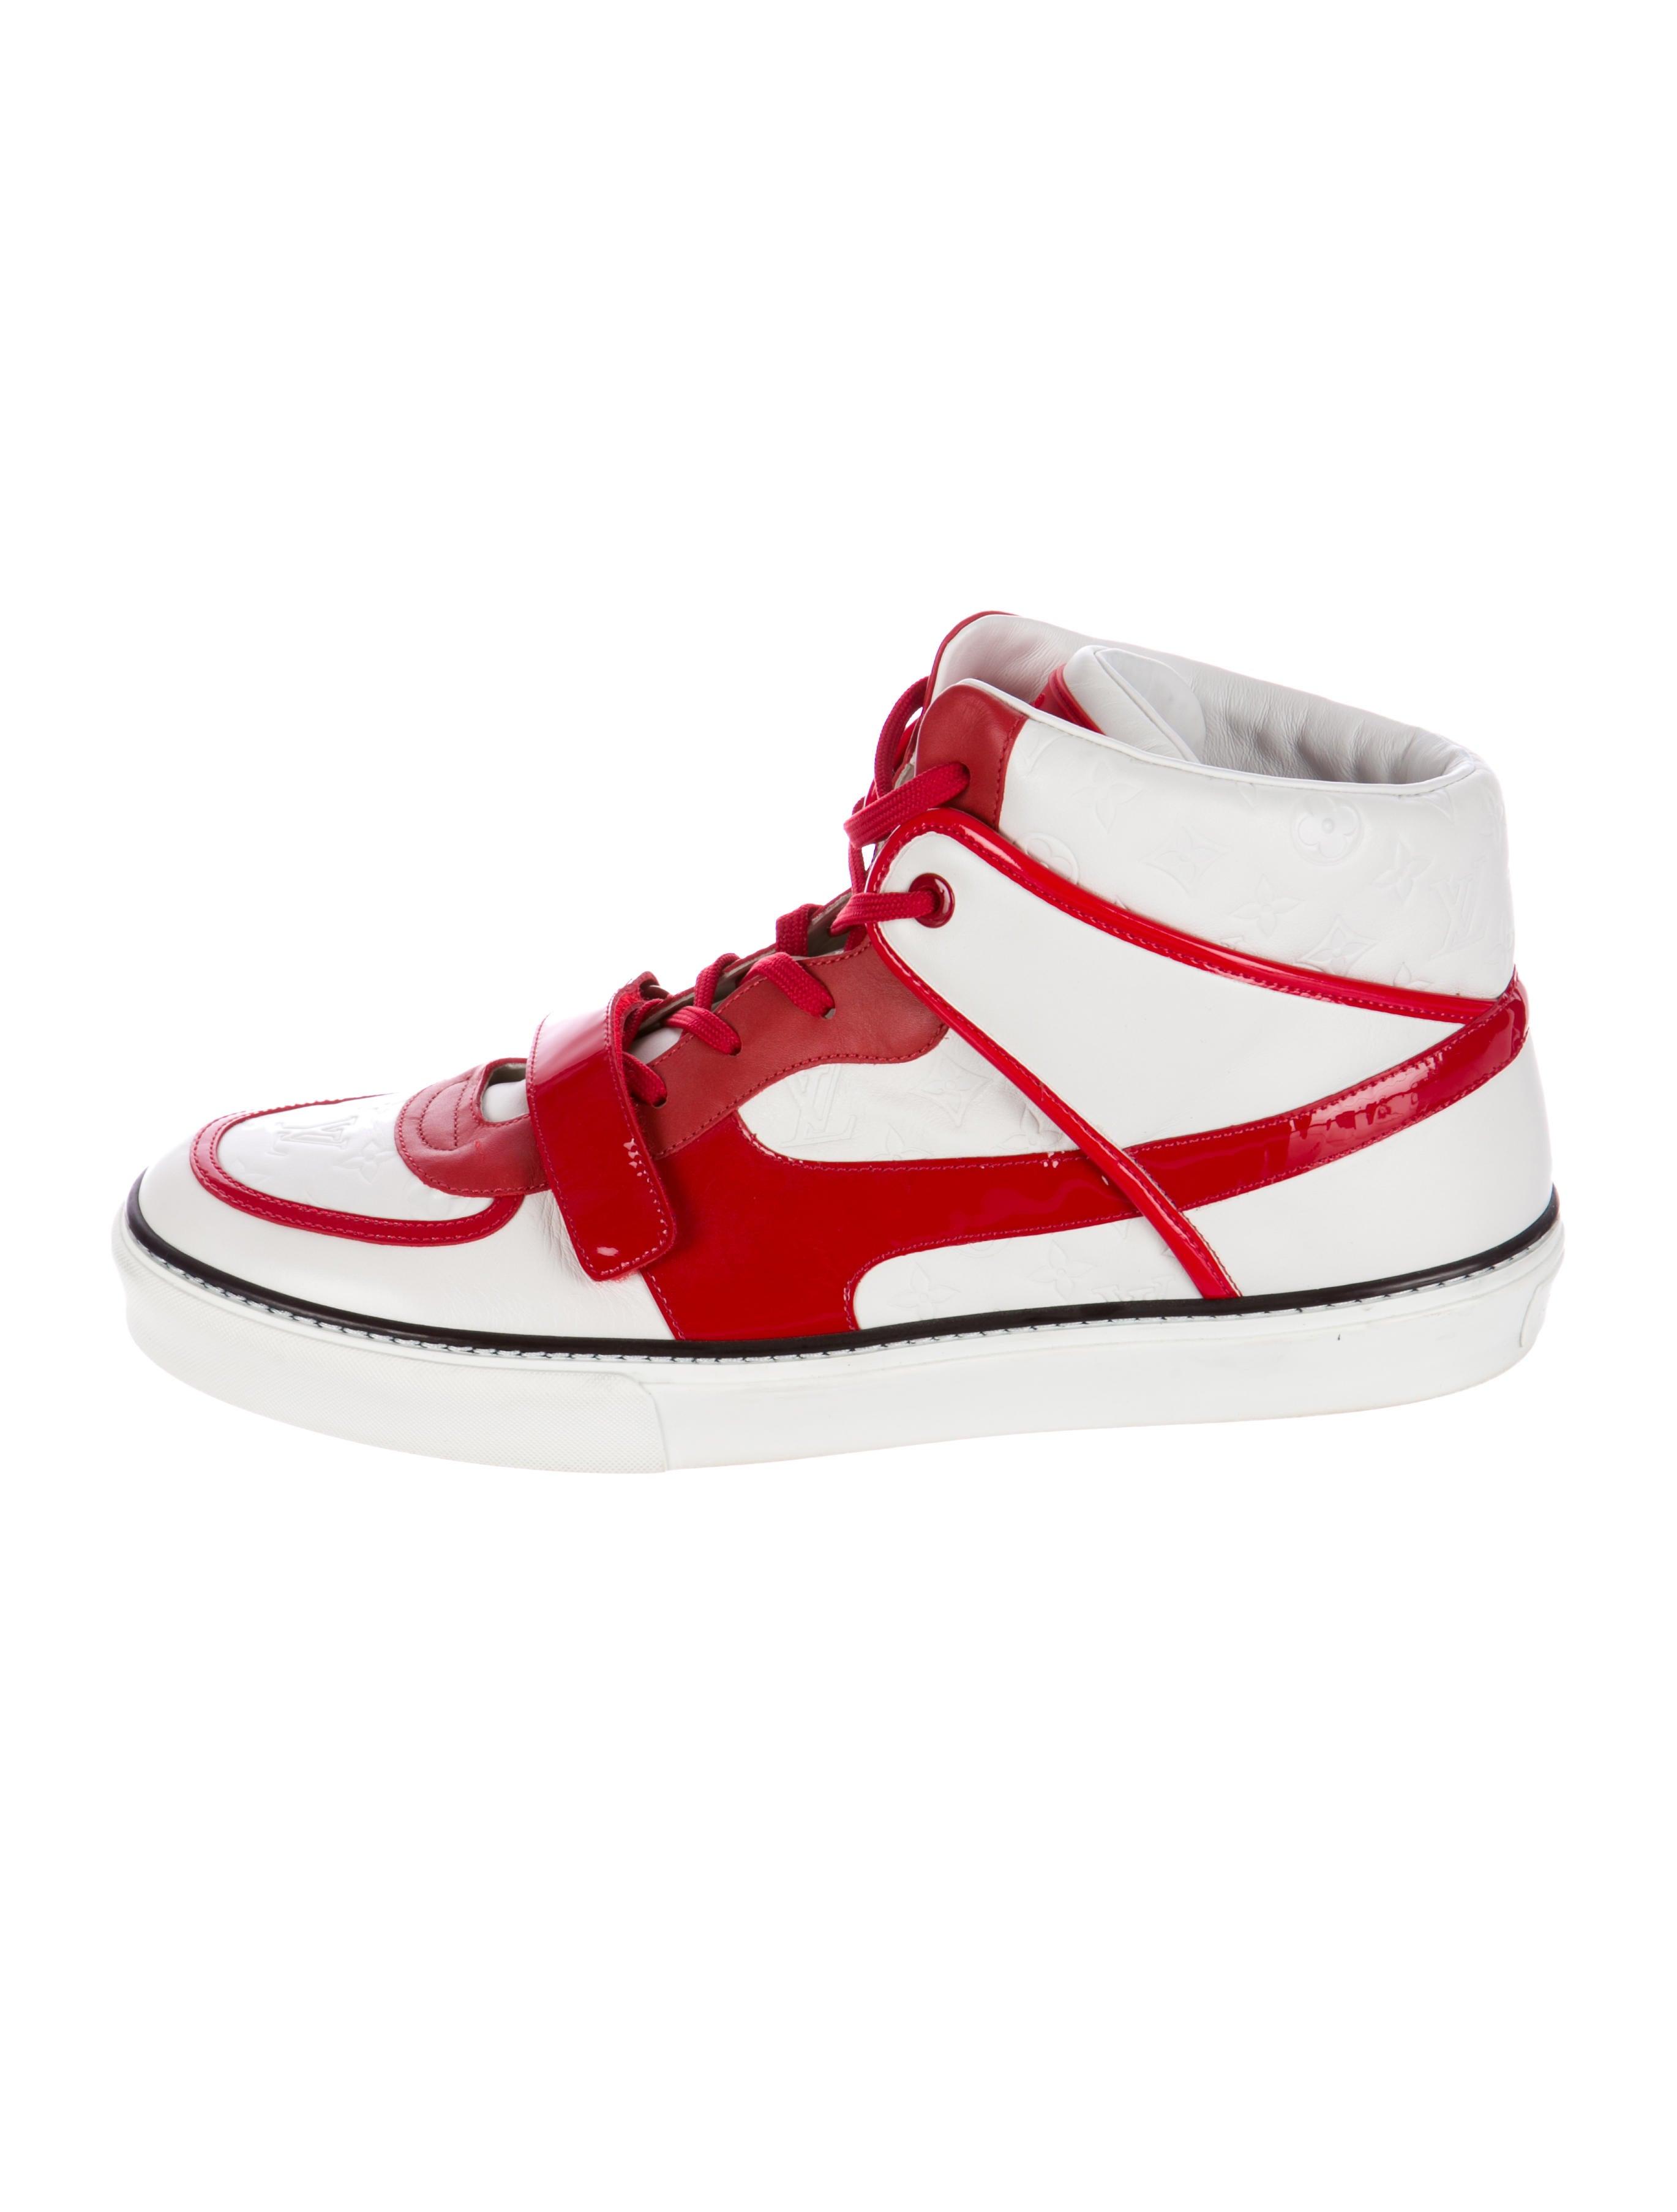 Louis Vuitton Monogram High-Top Sneakers - Mens Shoes - LOU48045 ...